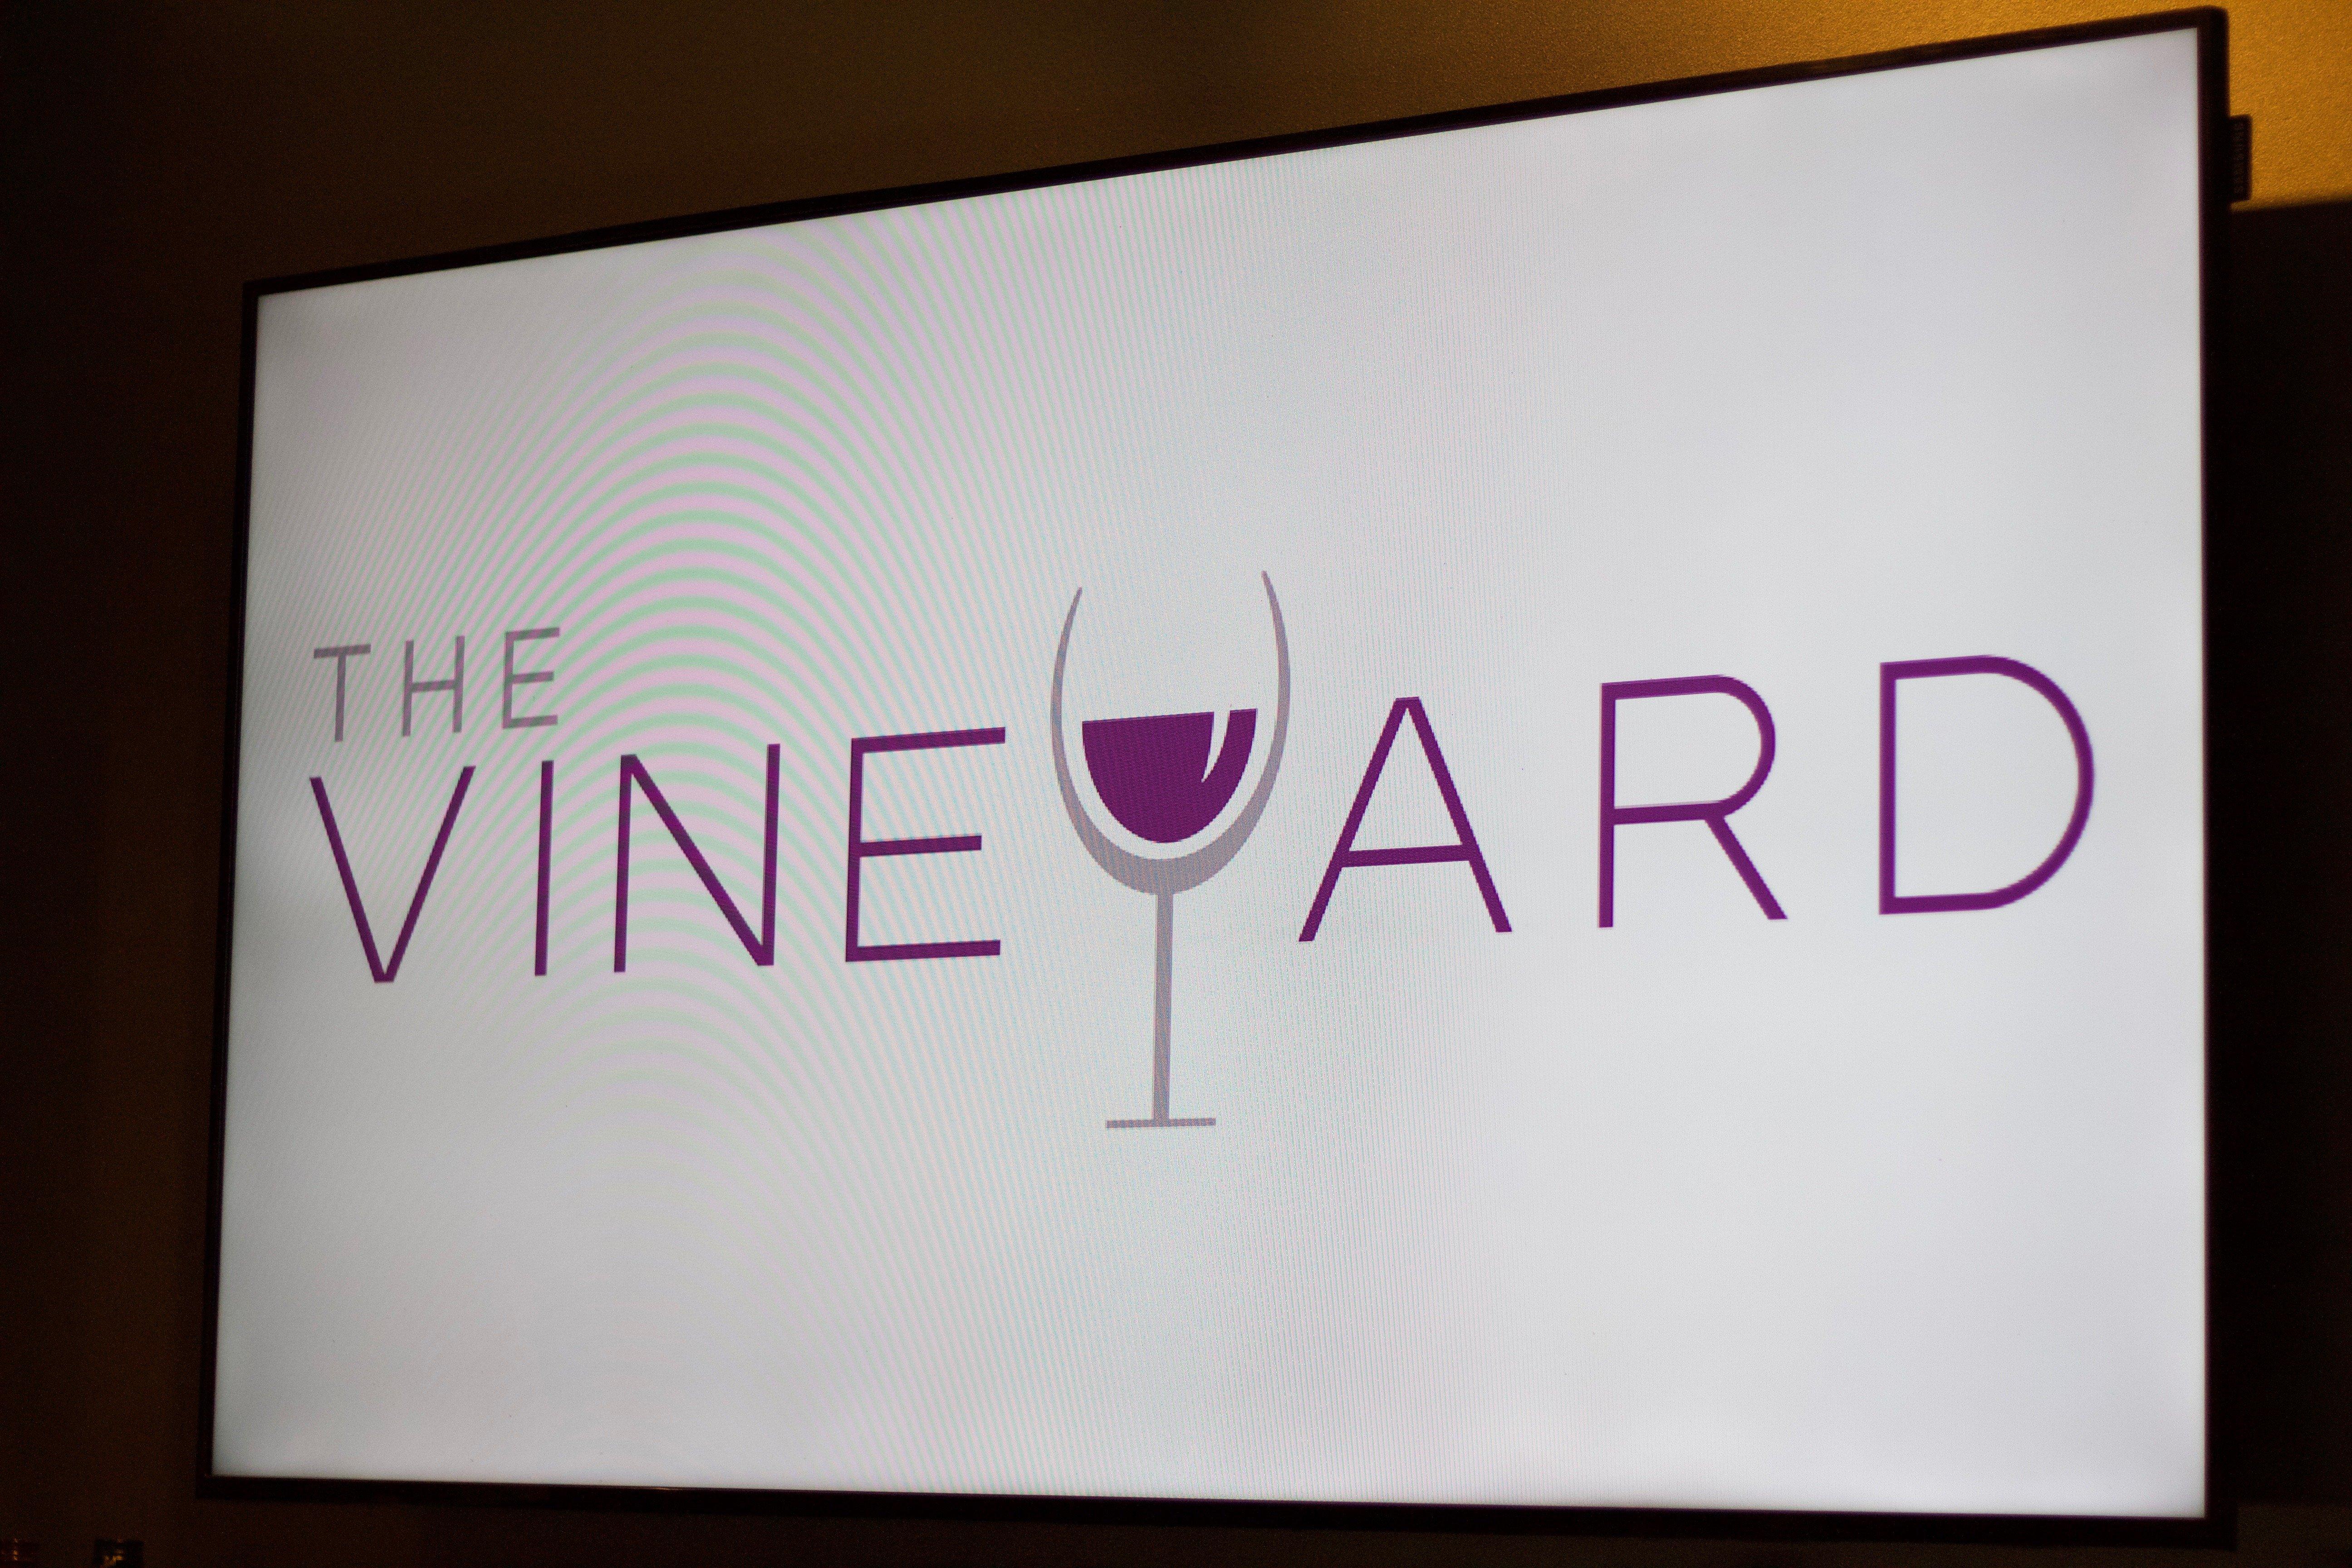 Chateau Le Parc Vaughan Banquet Hall Vineyard Restaurant Food Blogger Event